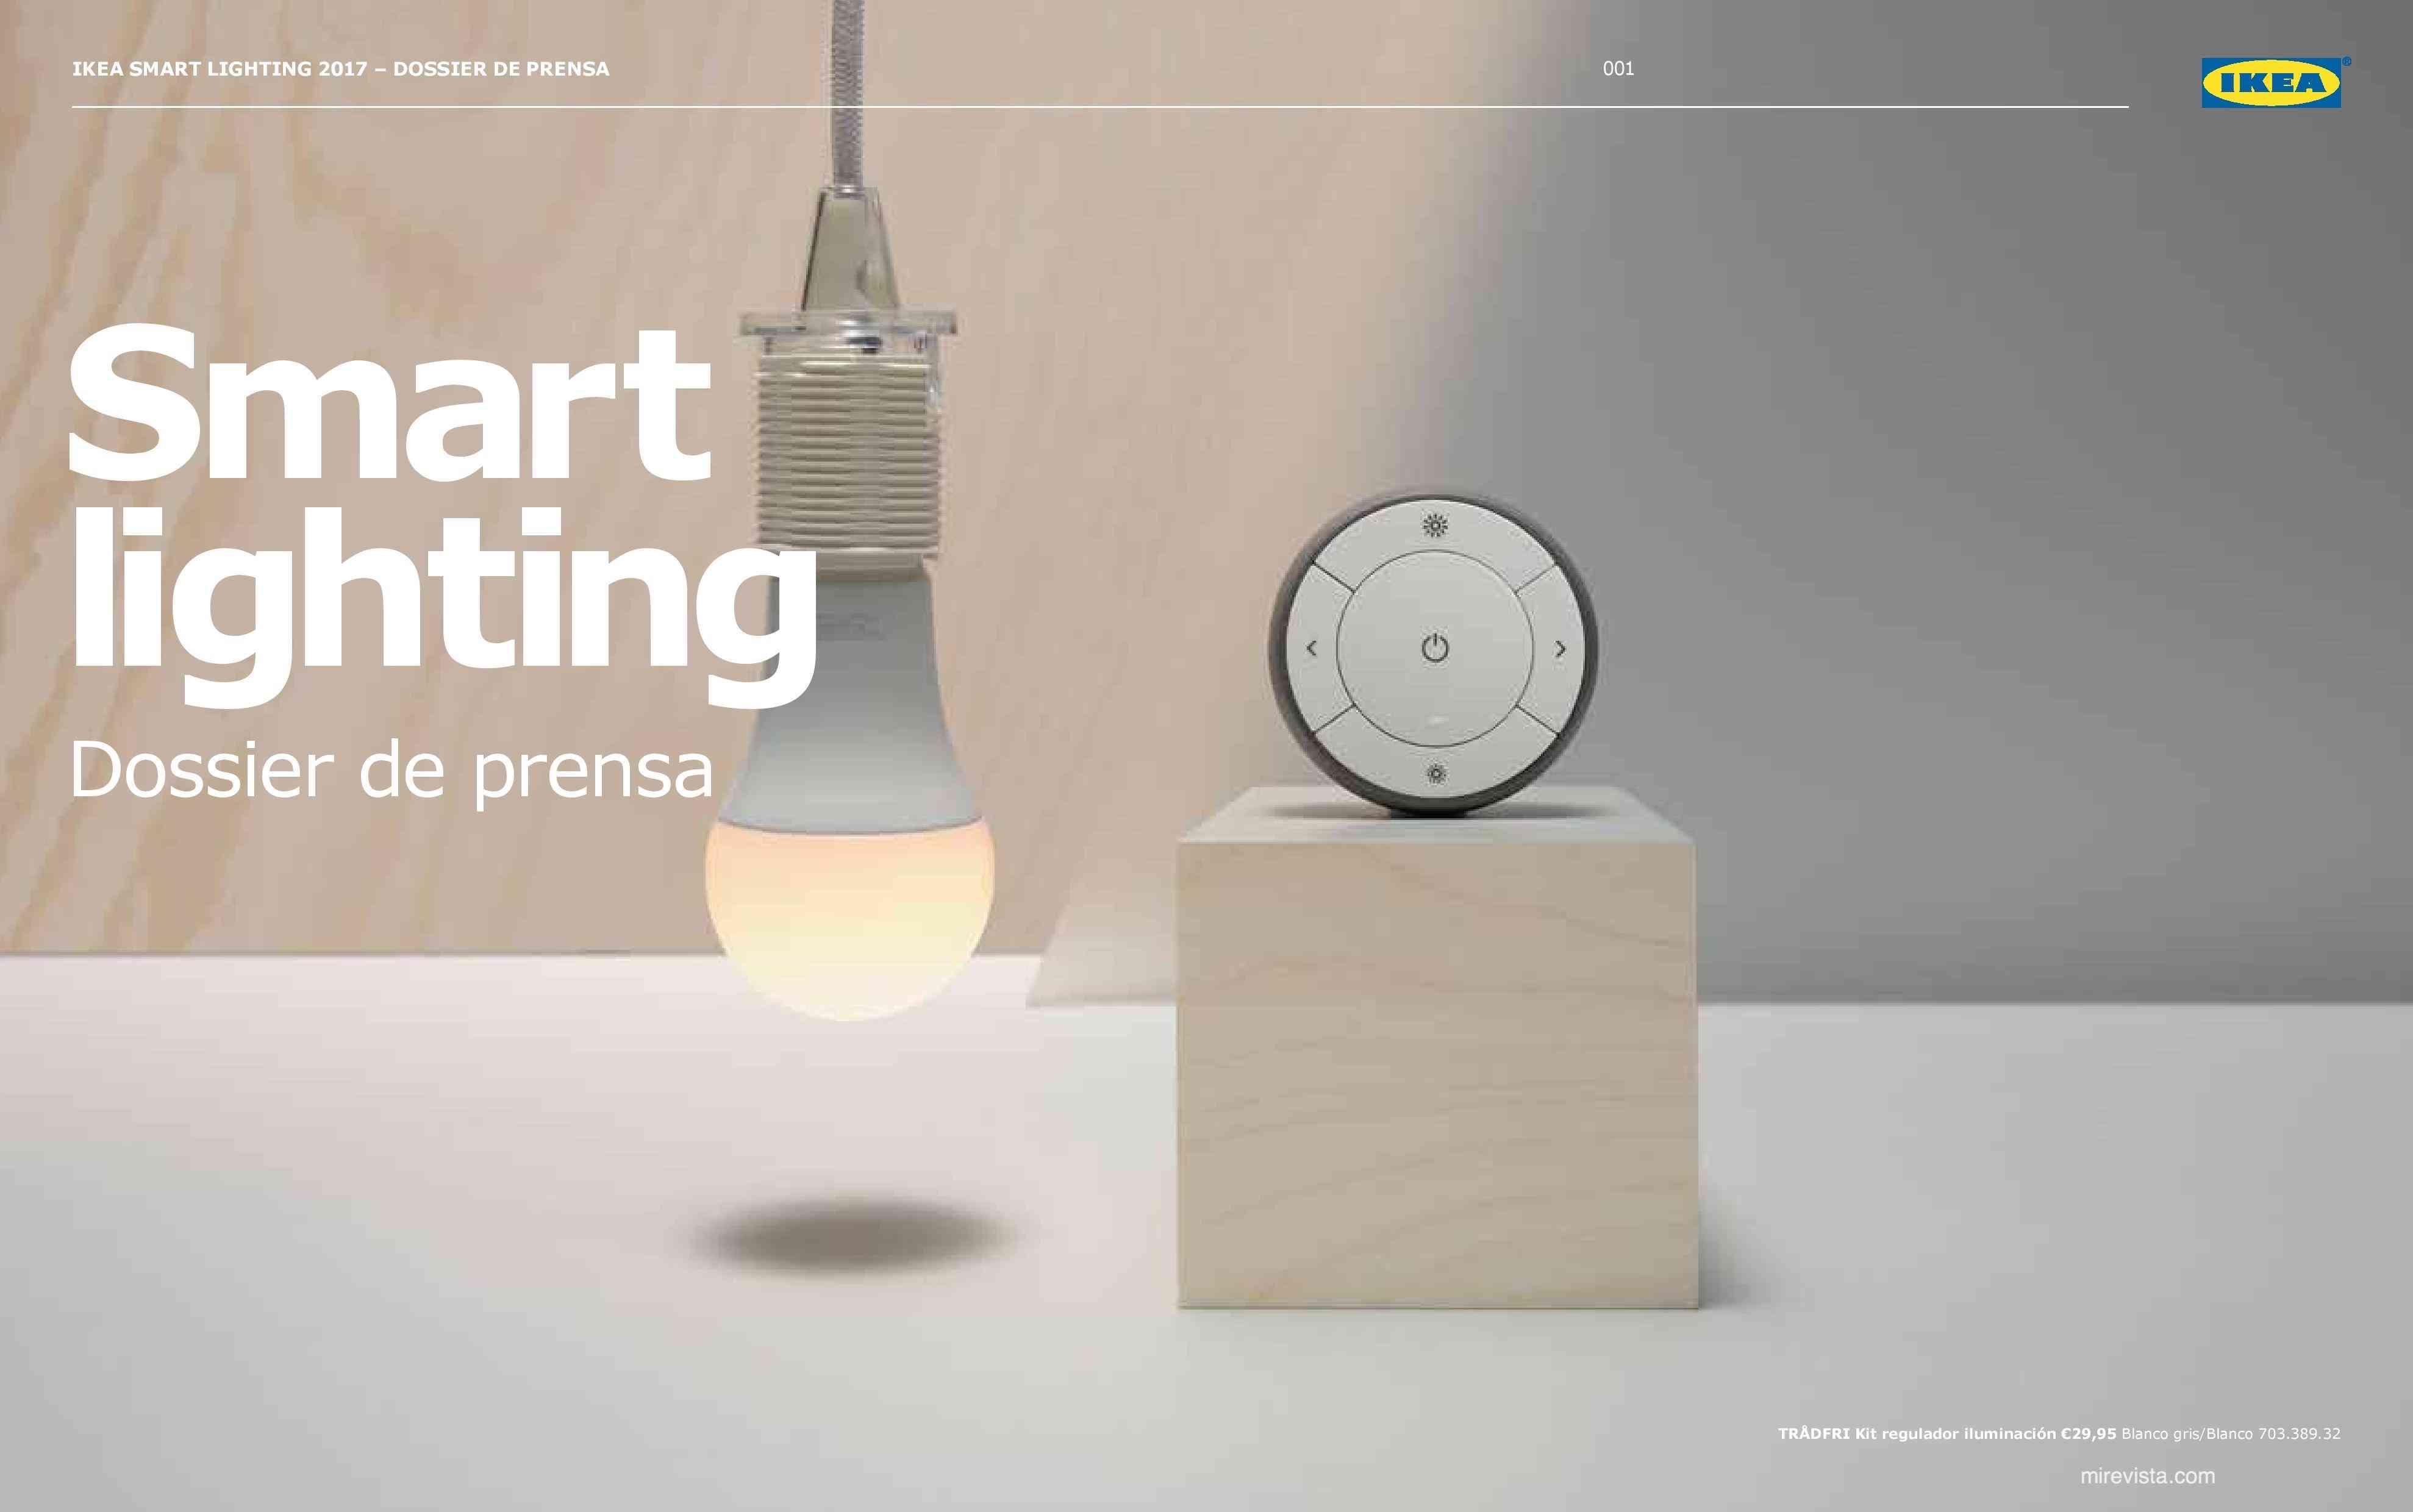 Novedades en iluminación de casas inteligentes con IKEA 57